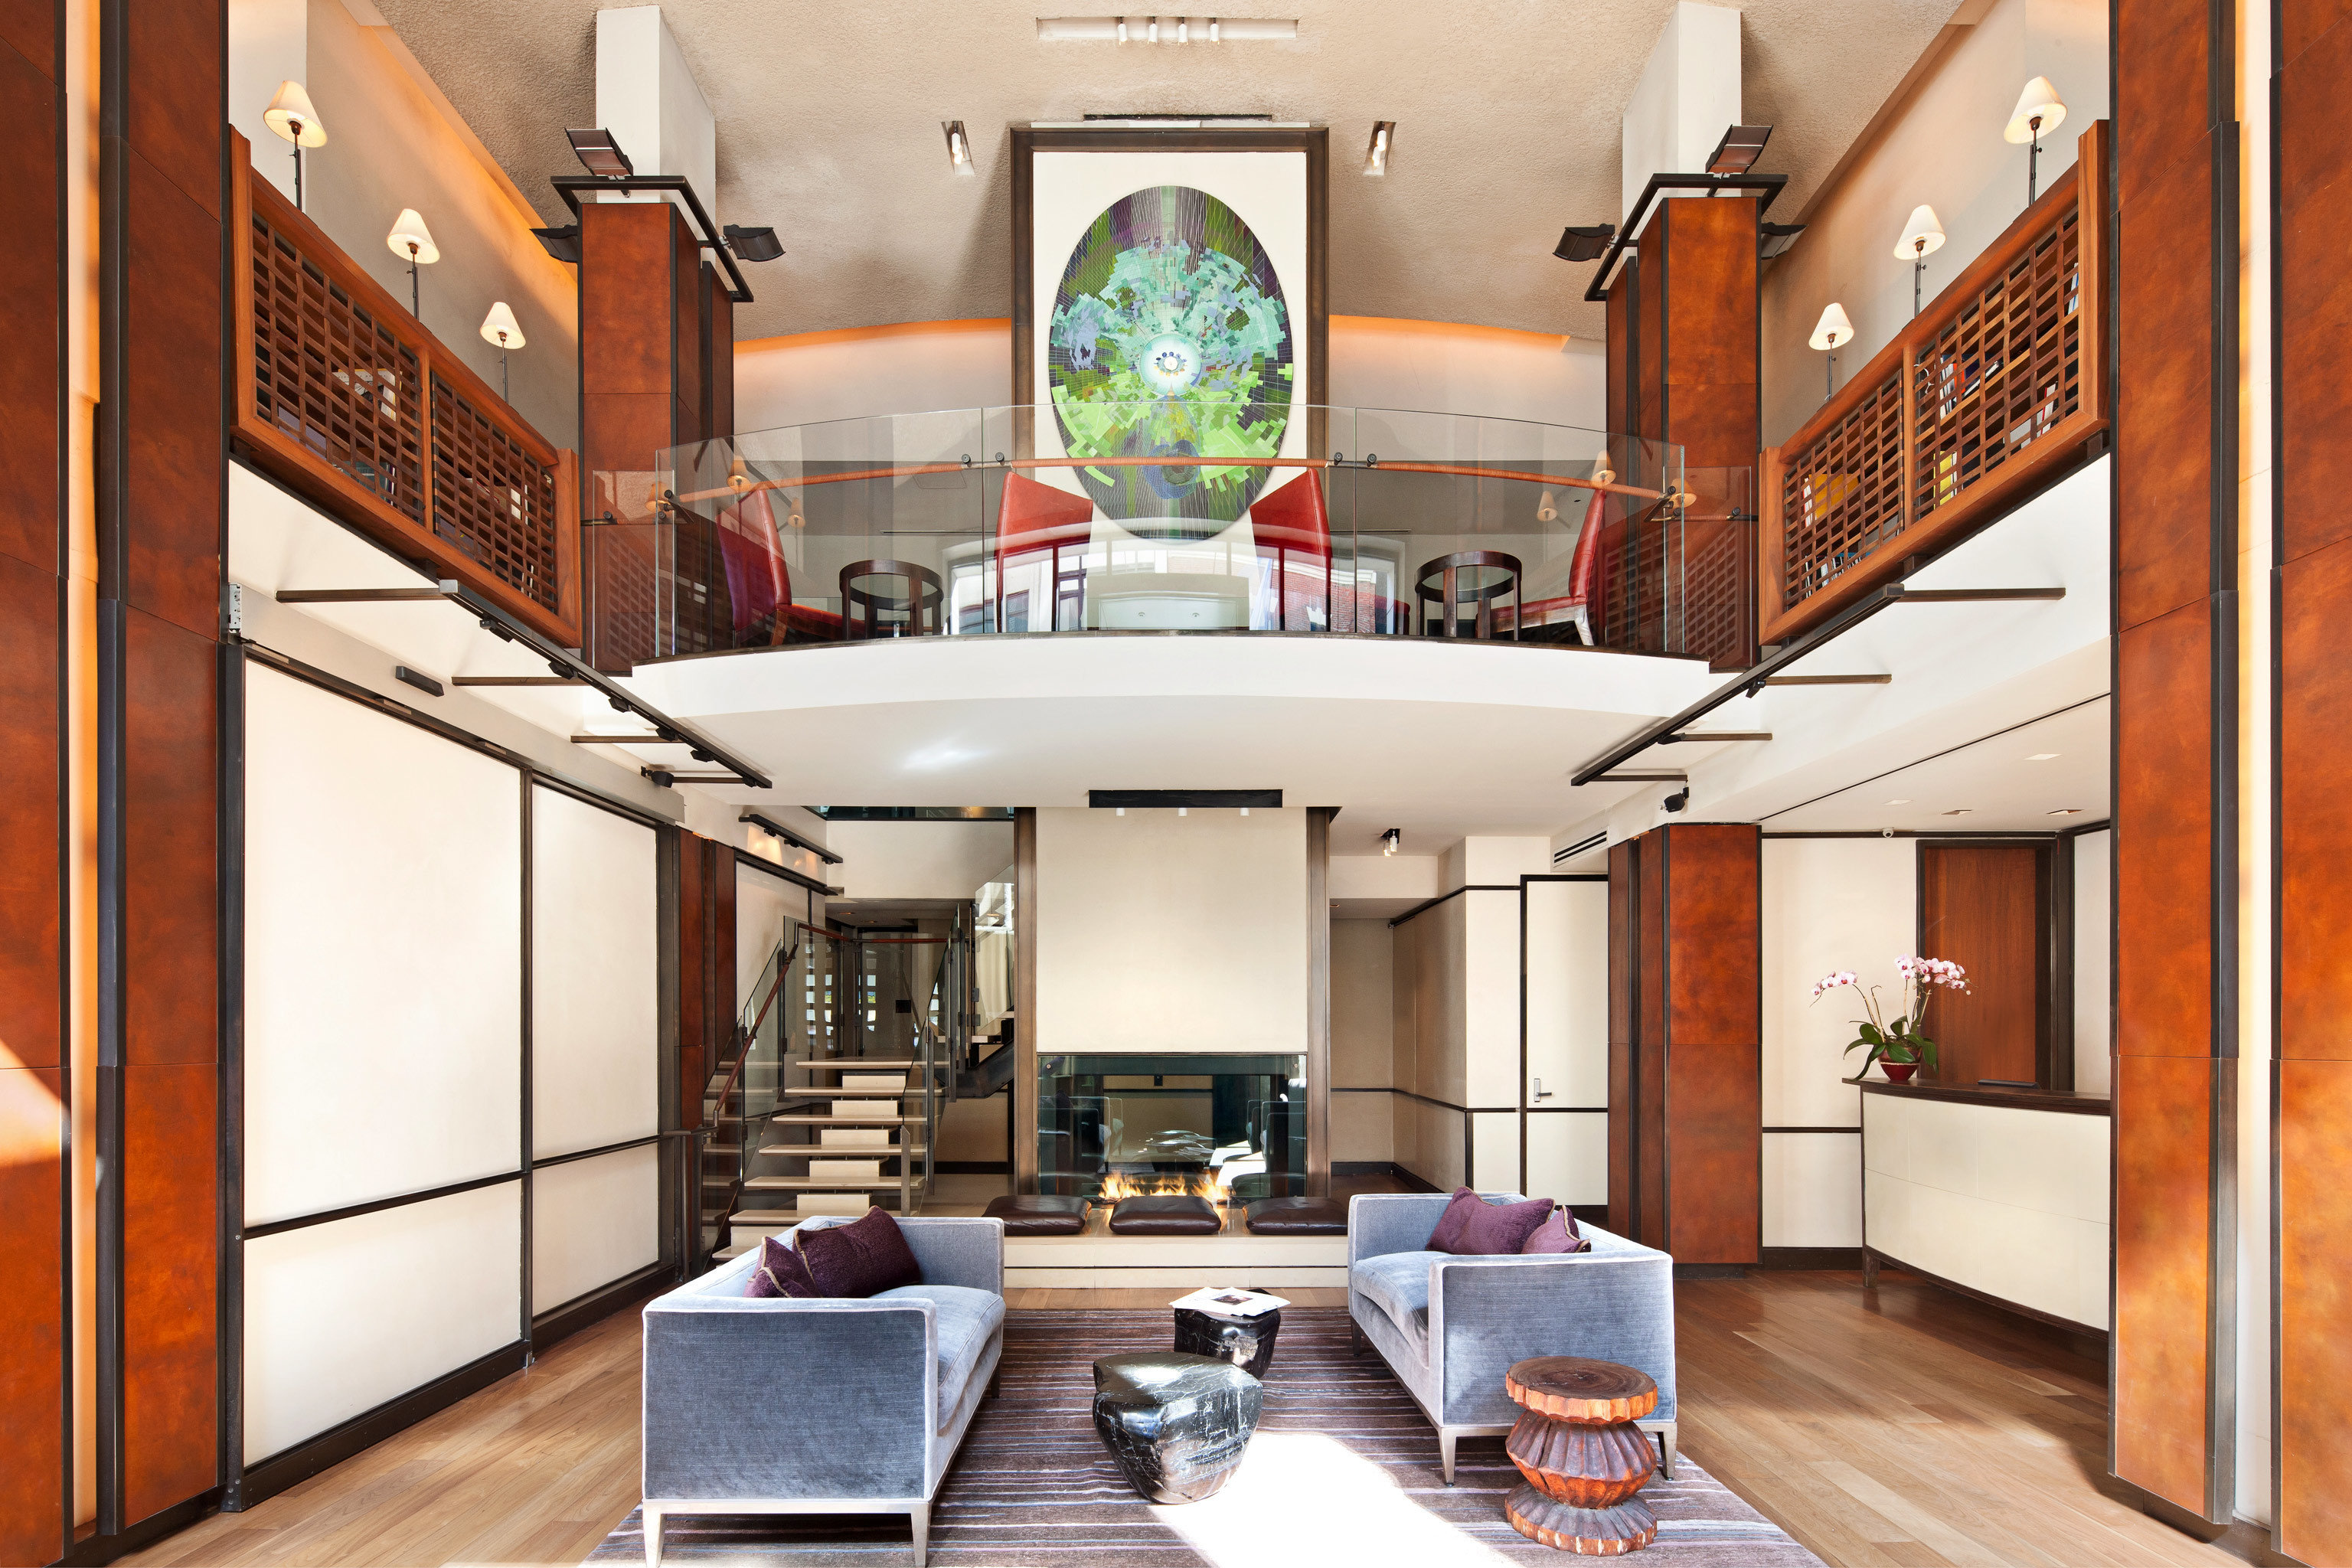 Boutique City Lobby Lounge Modern living room property home hardwood mansion loft cottage farmhouse